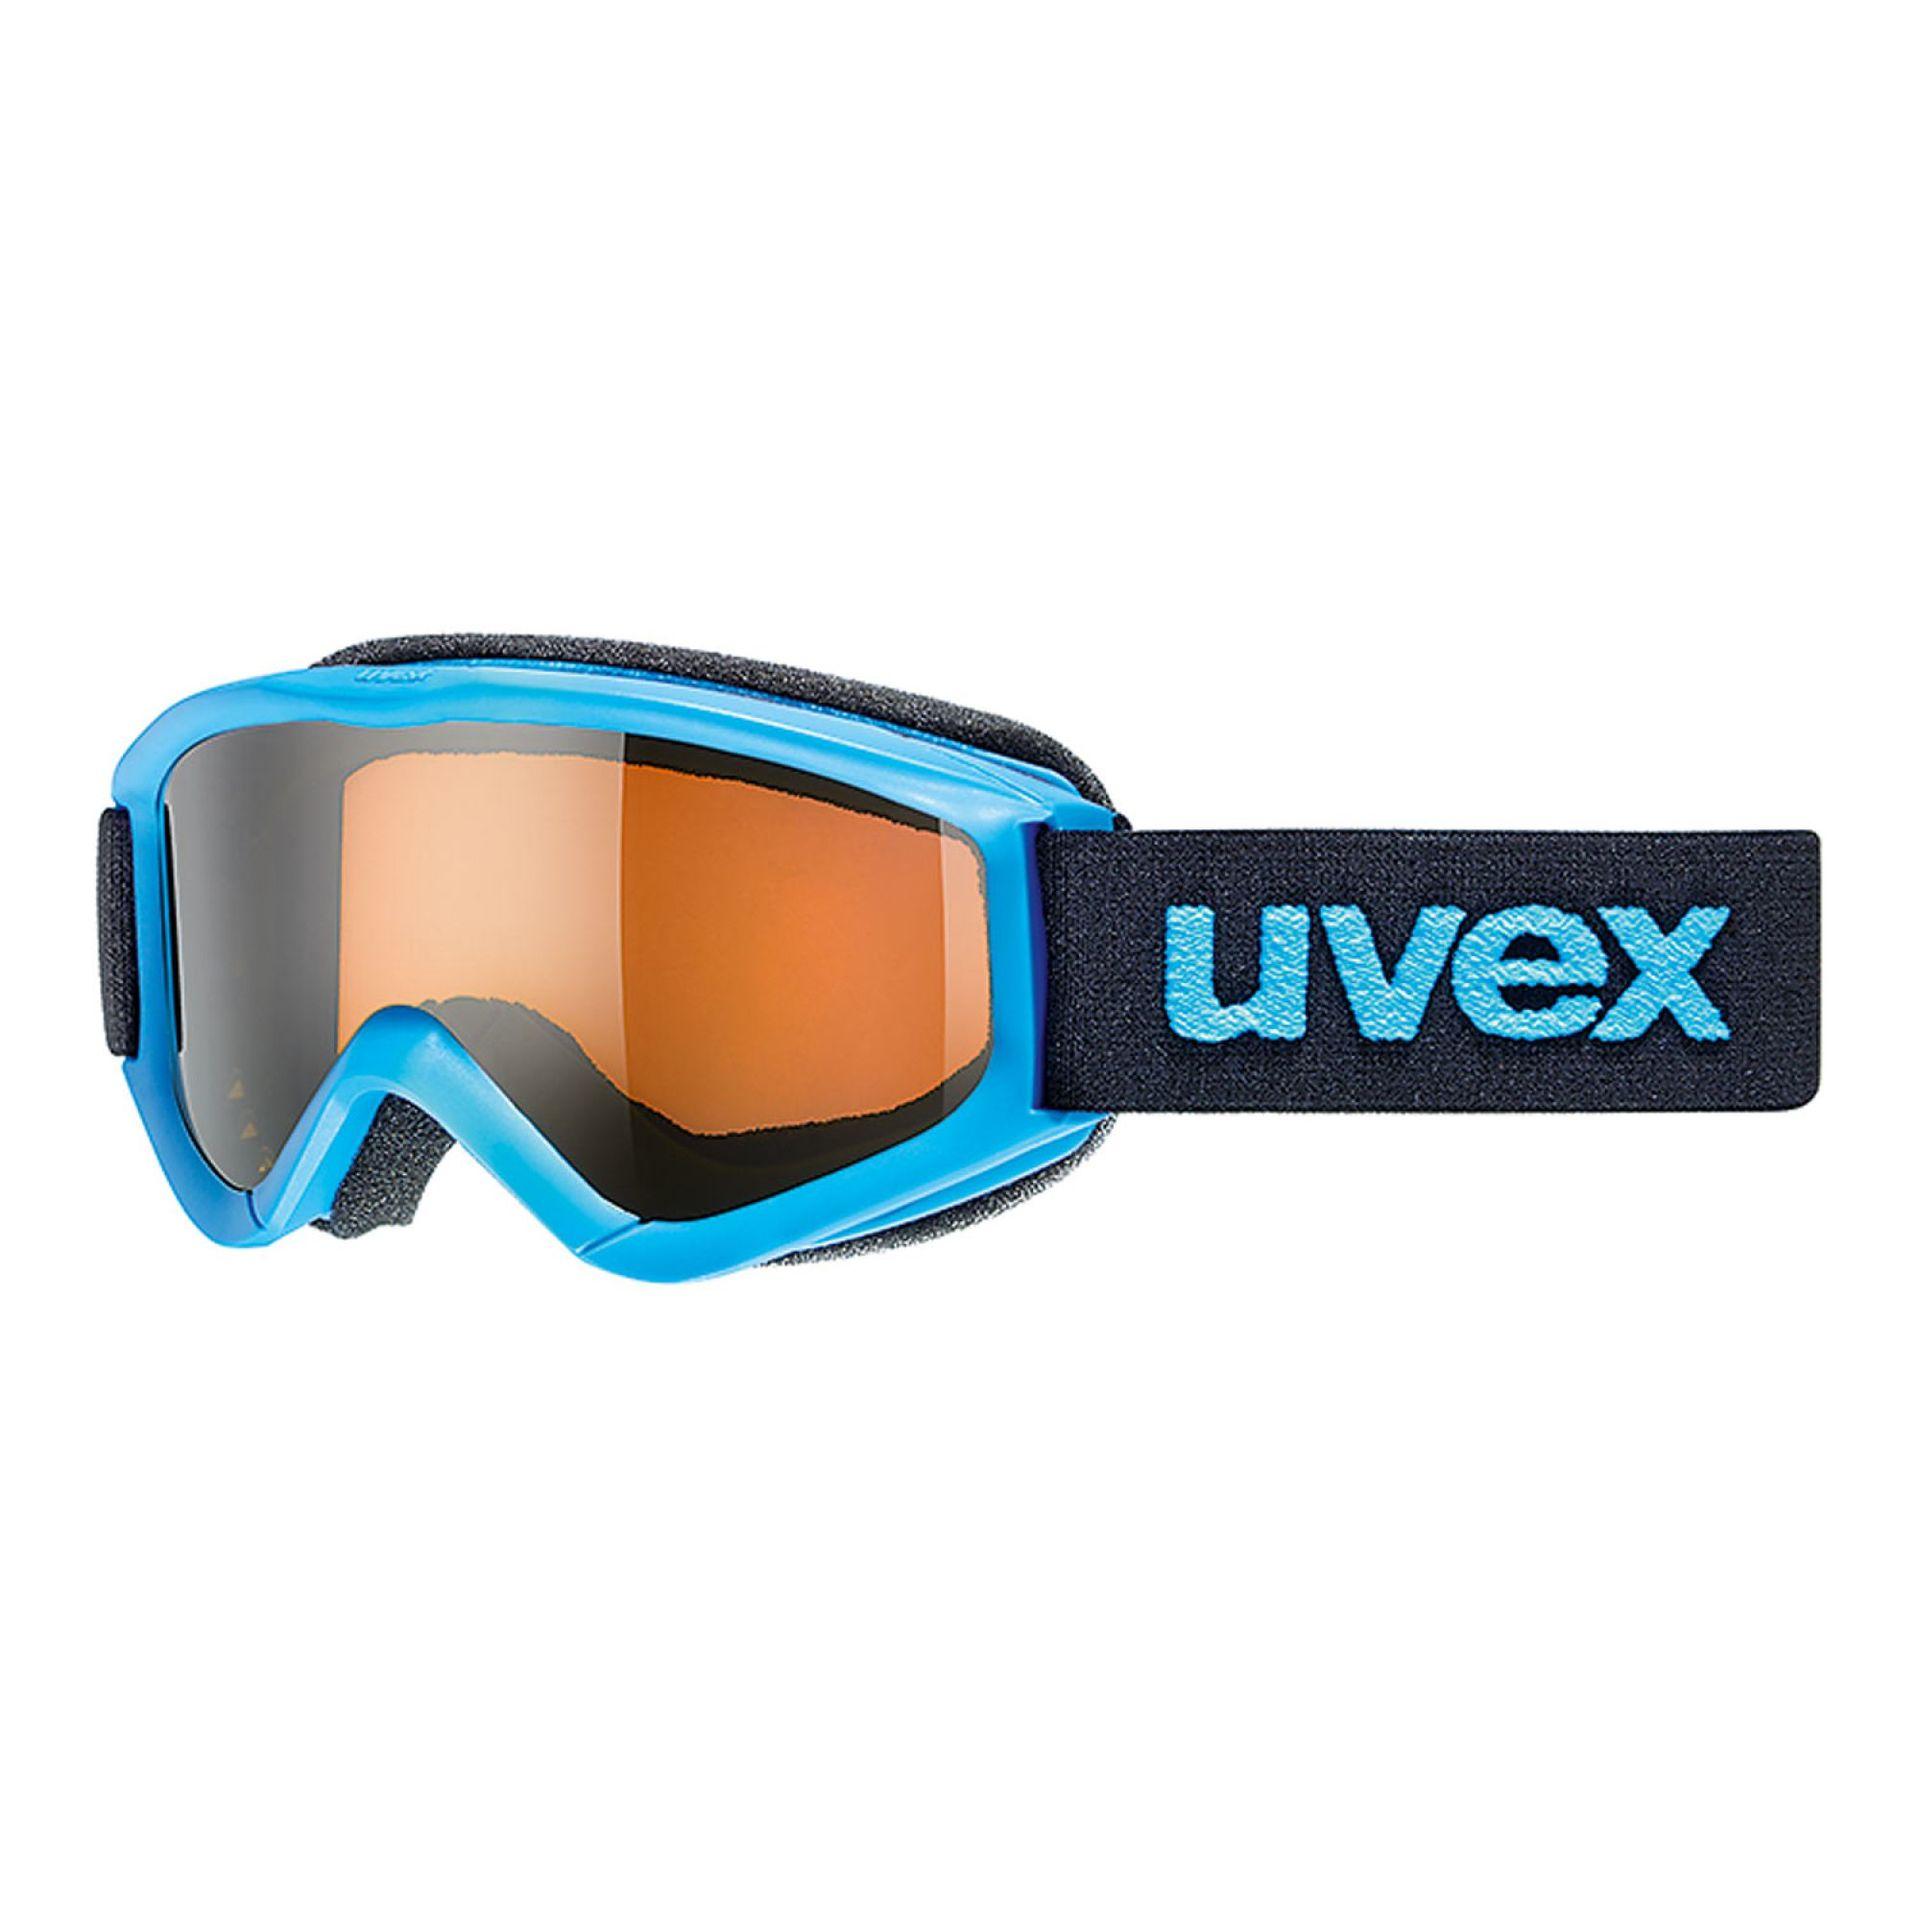 GOGLE UVEX  SPEEDY PRO BLUE